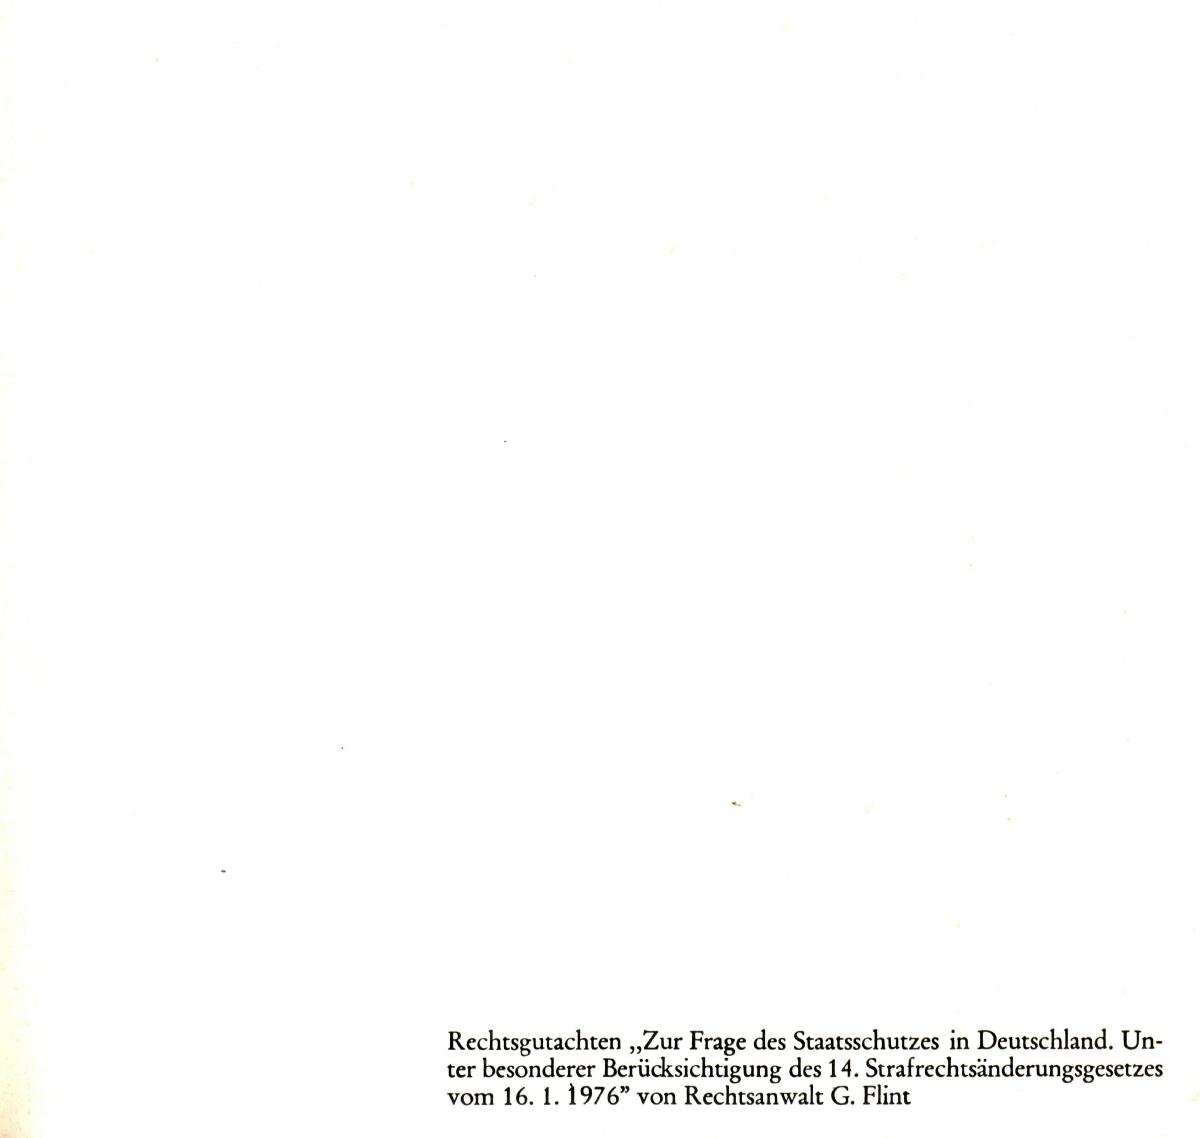 REP_VLB_1976_Die_Zensurgesetze_14